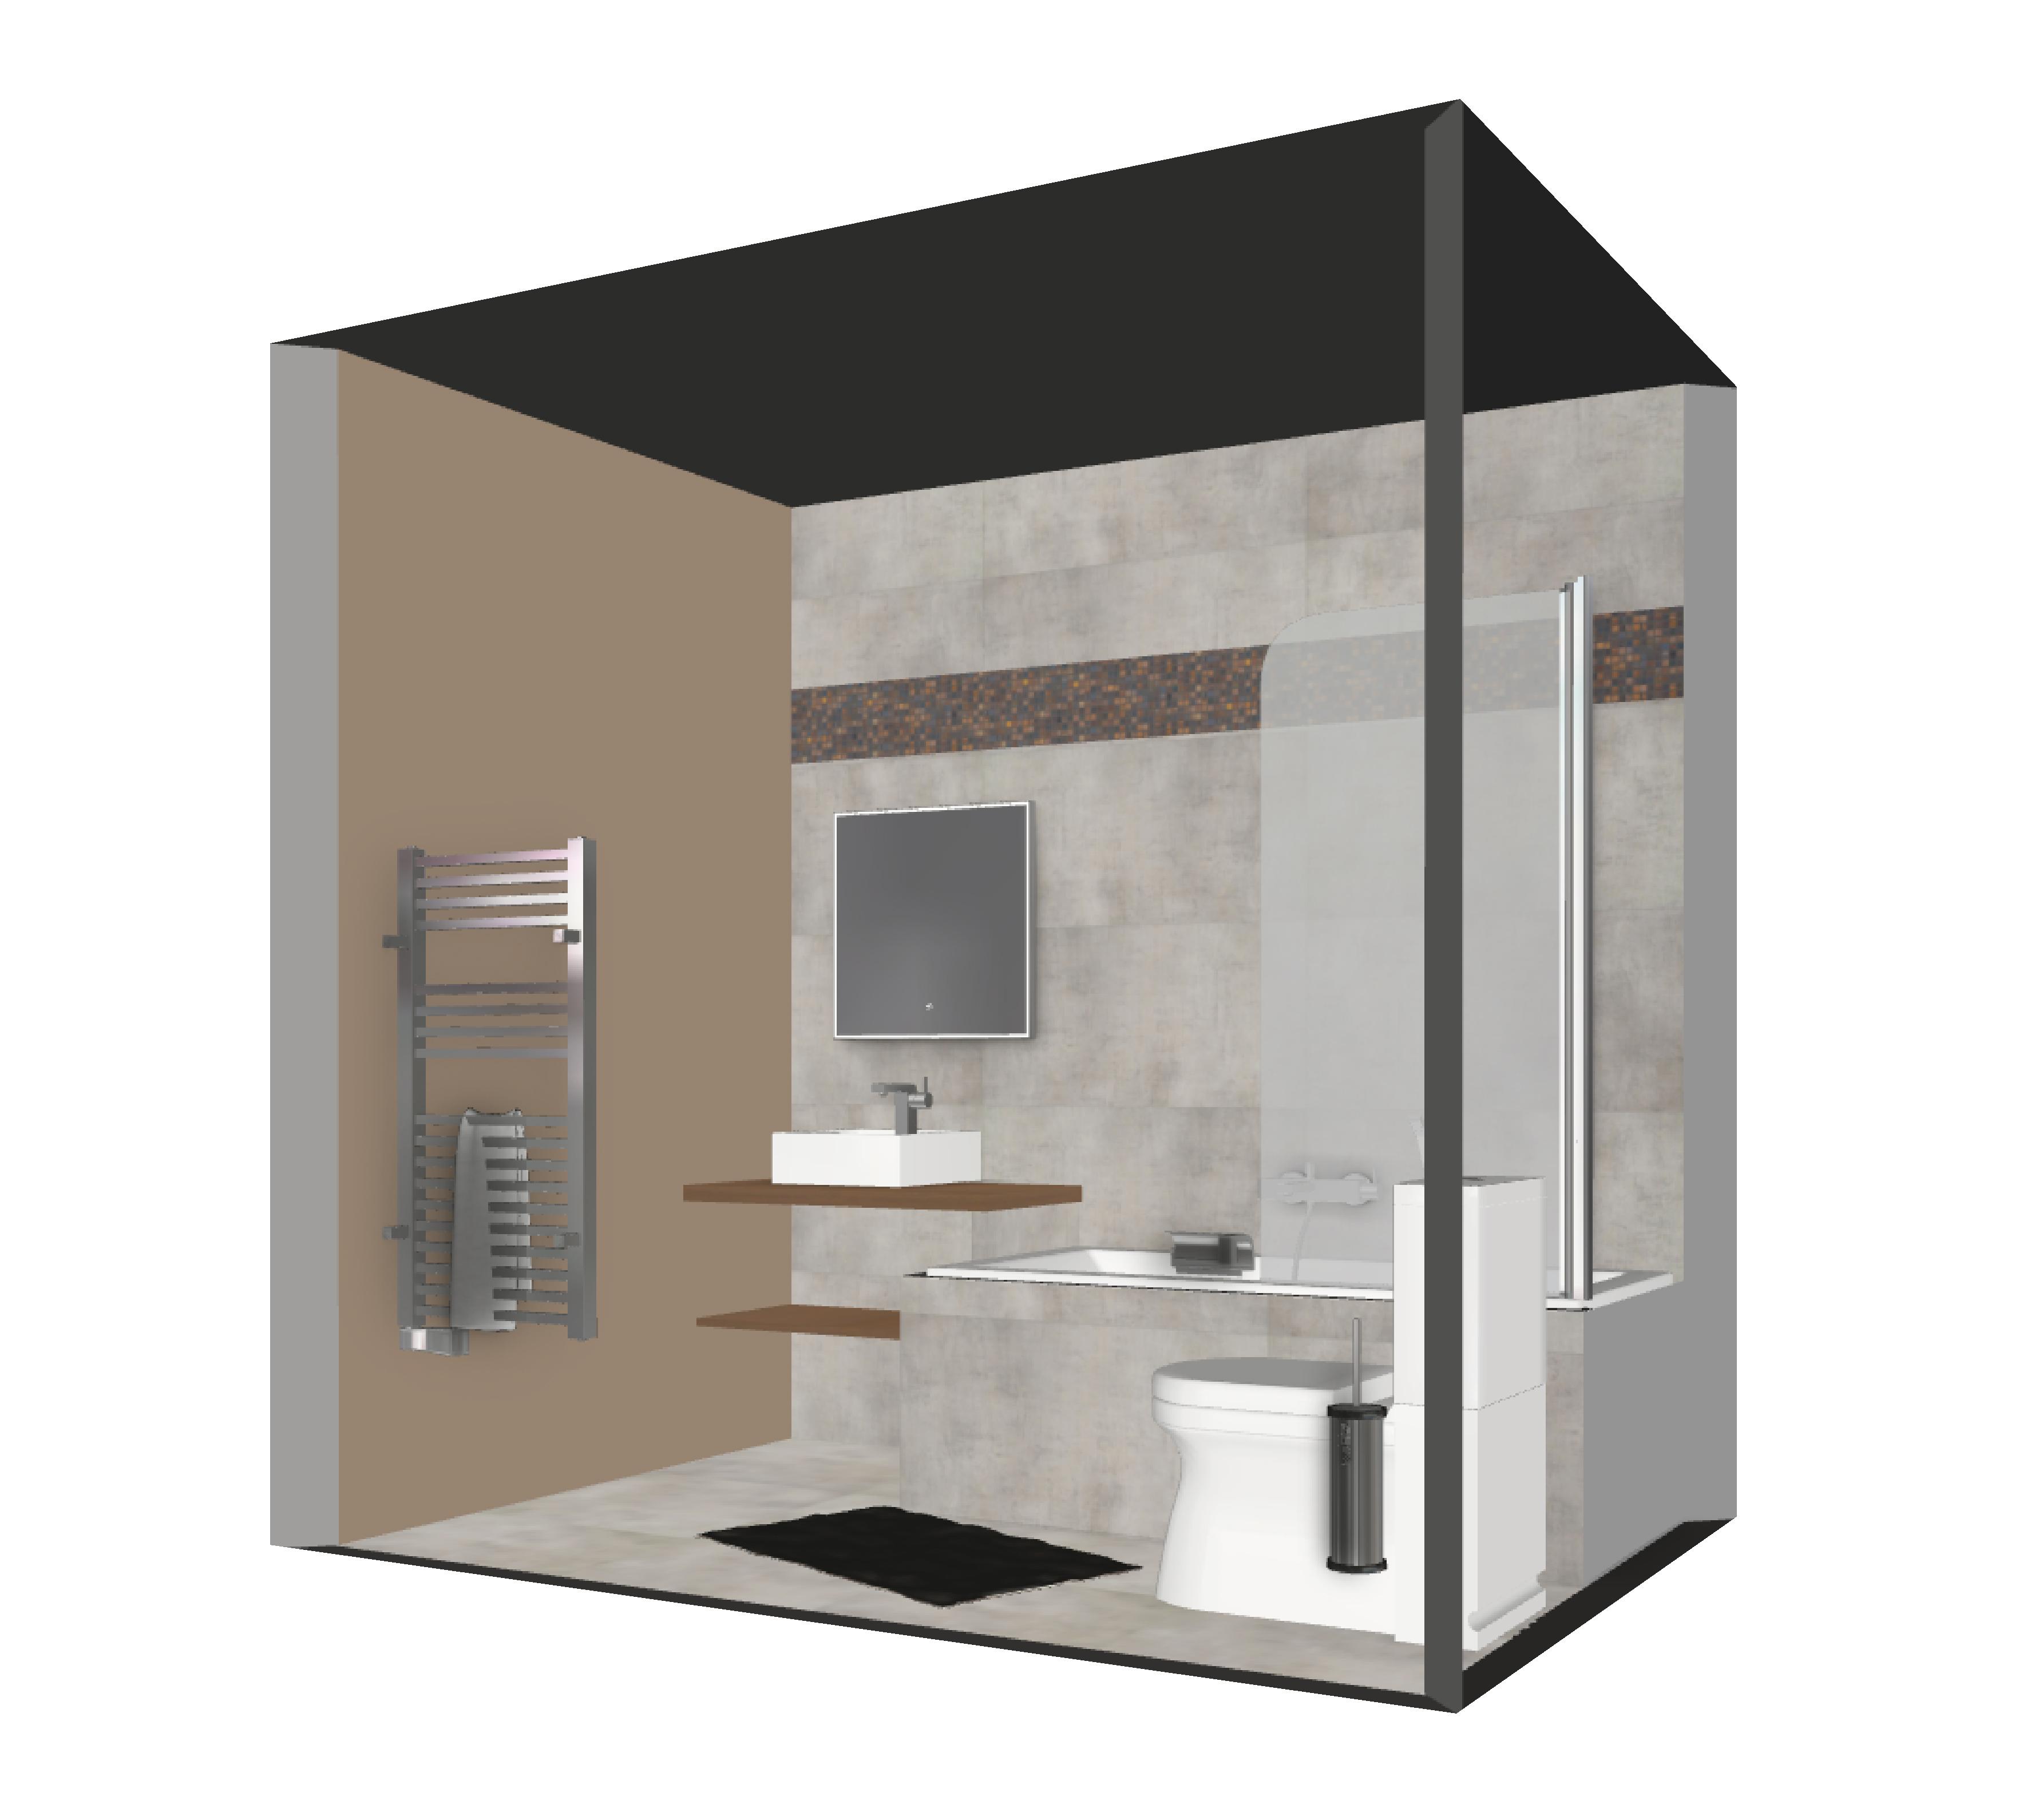 Salle de bain marocaine photo - Baignoire salle de bain maroc ...